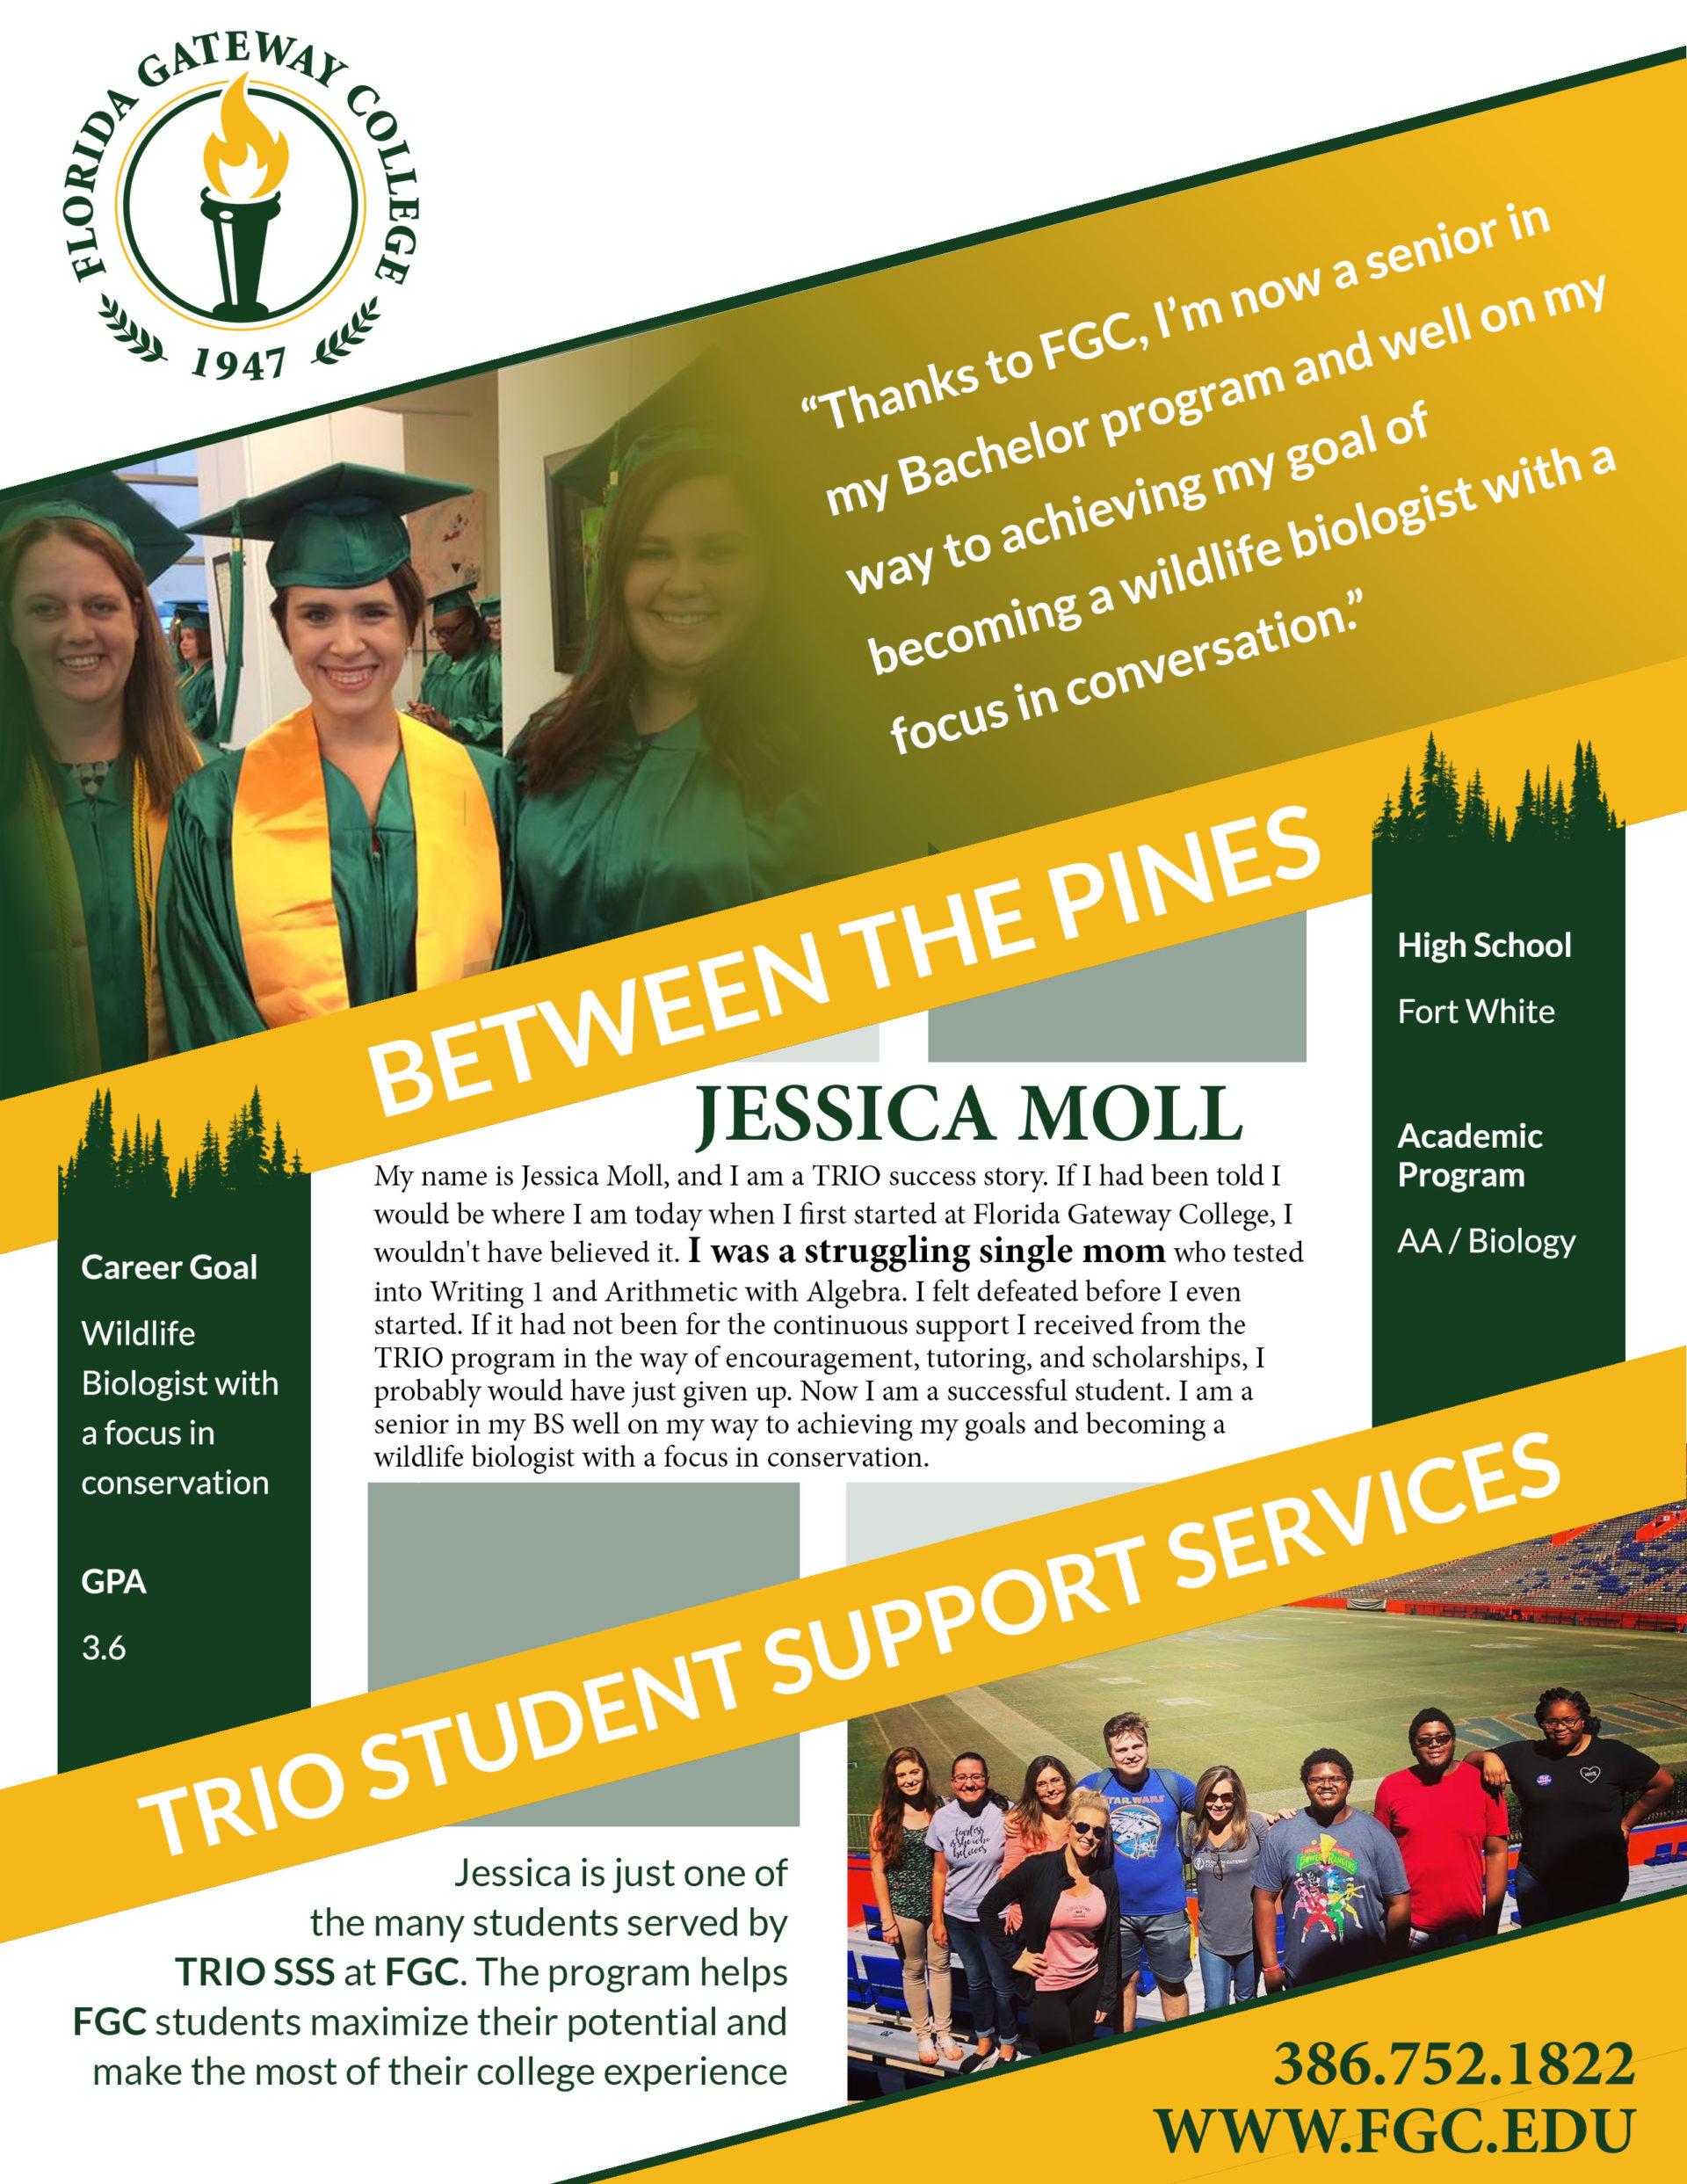 Jessica Moll's Story